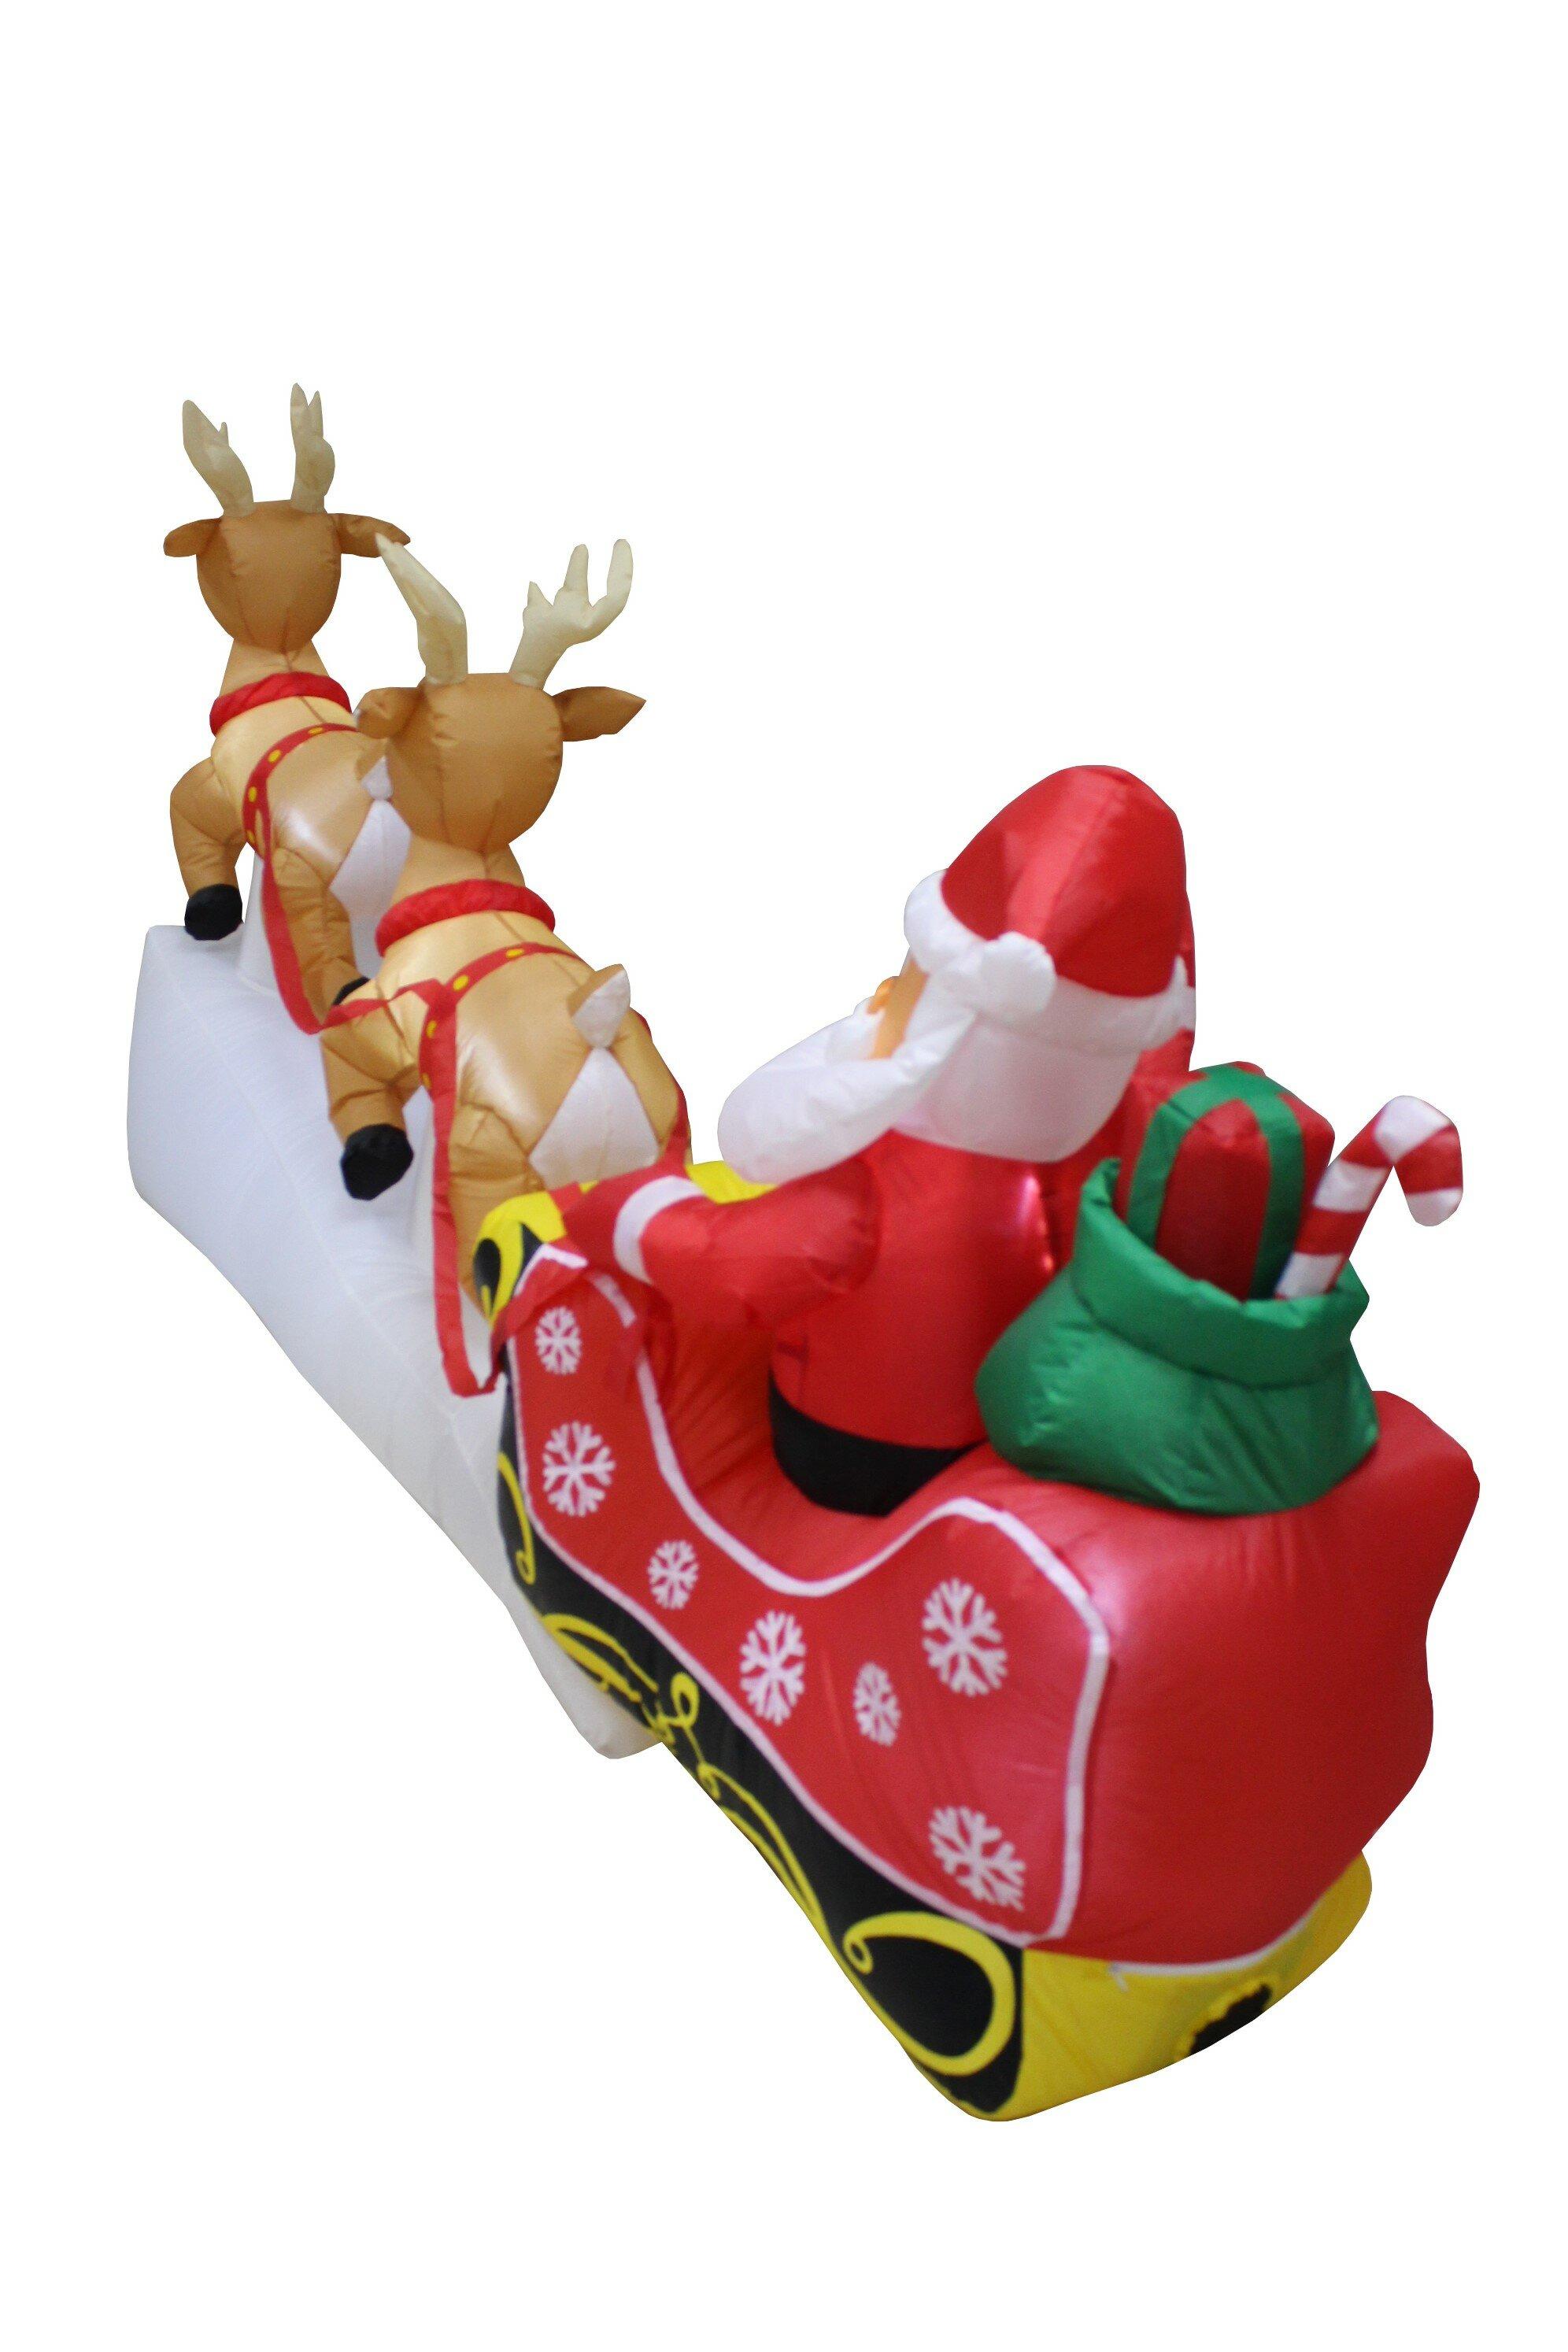 a55ce49b09 Santa Claus Reindeer Sleigh Christmas Inflatable